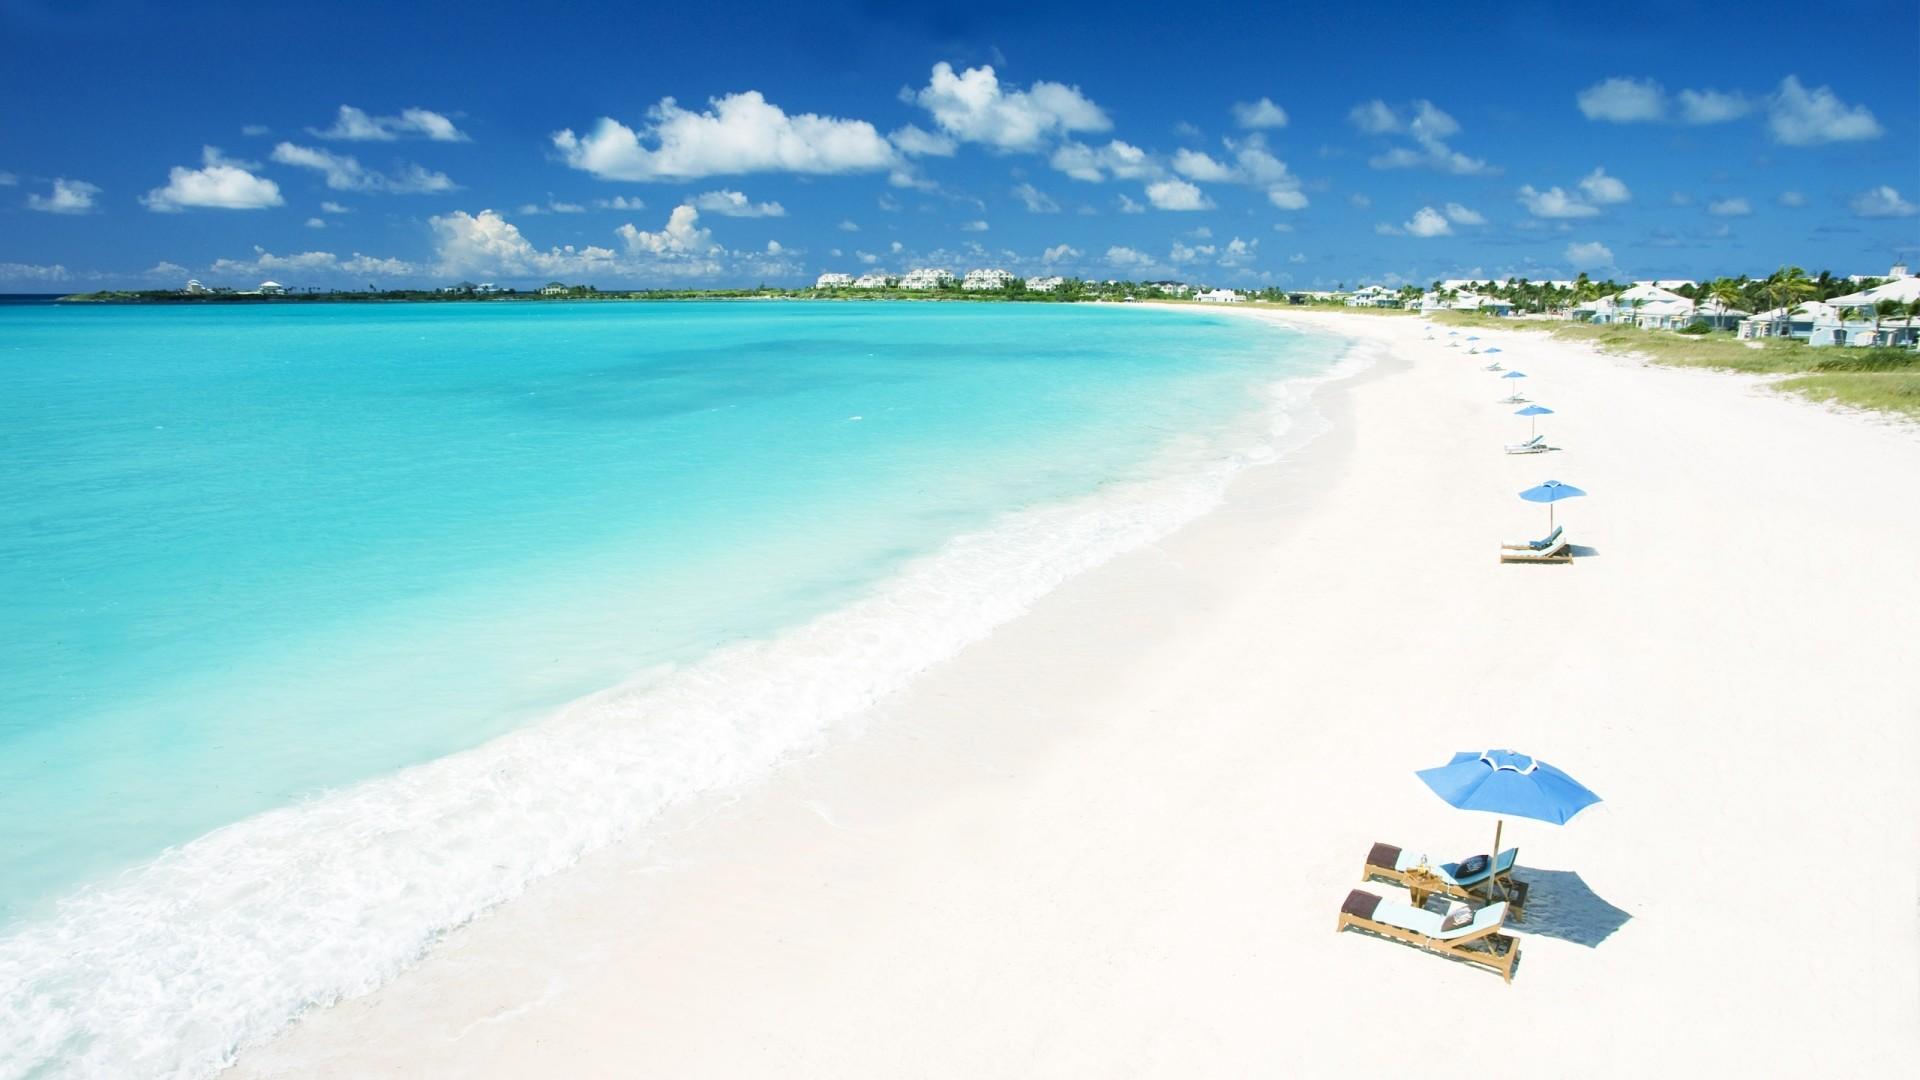 hd wallpaper beach picture